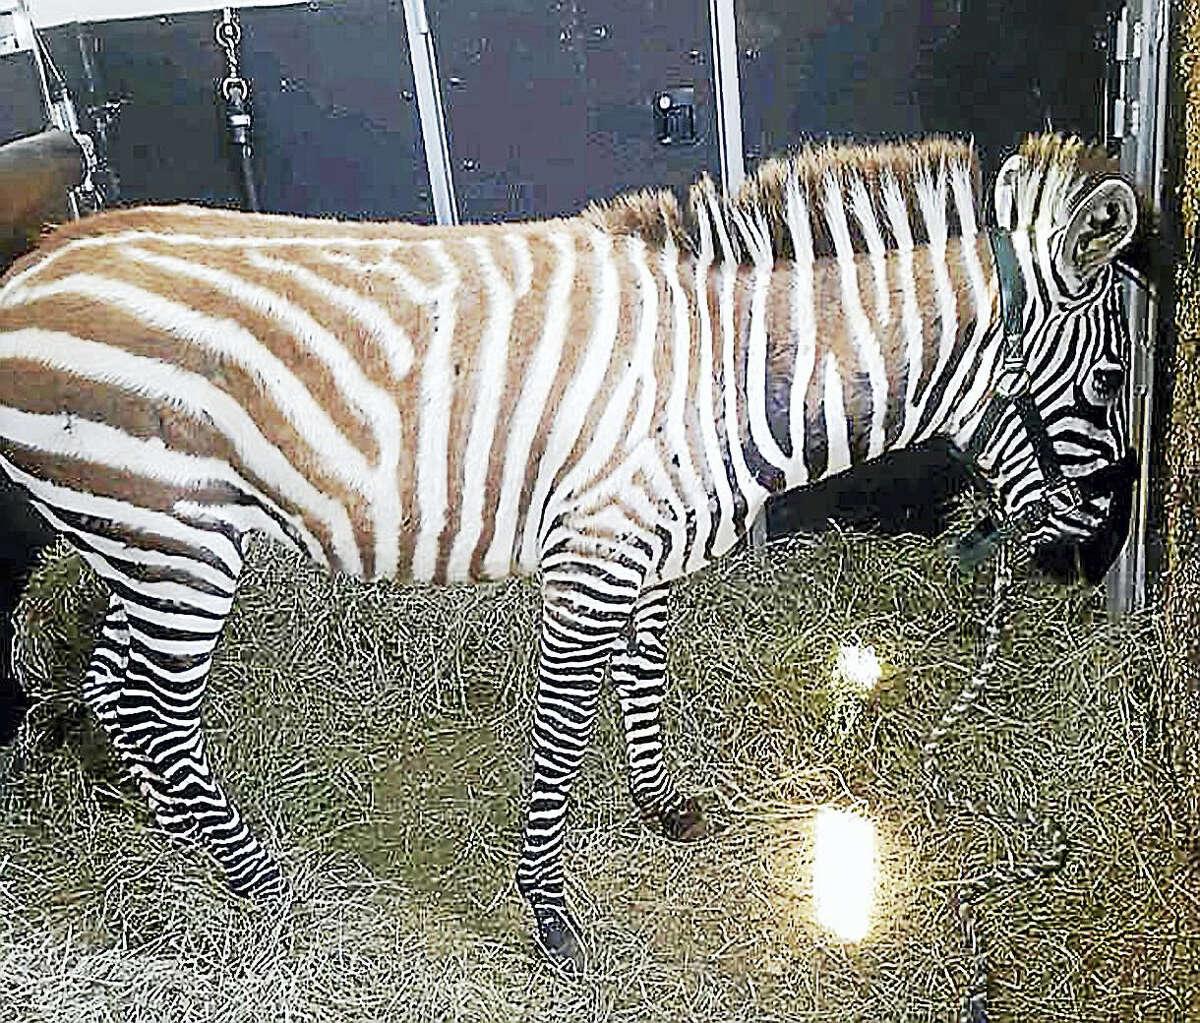 Zula, a 5-month-old zebra, was found dead on state land.